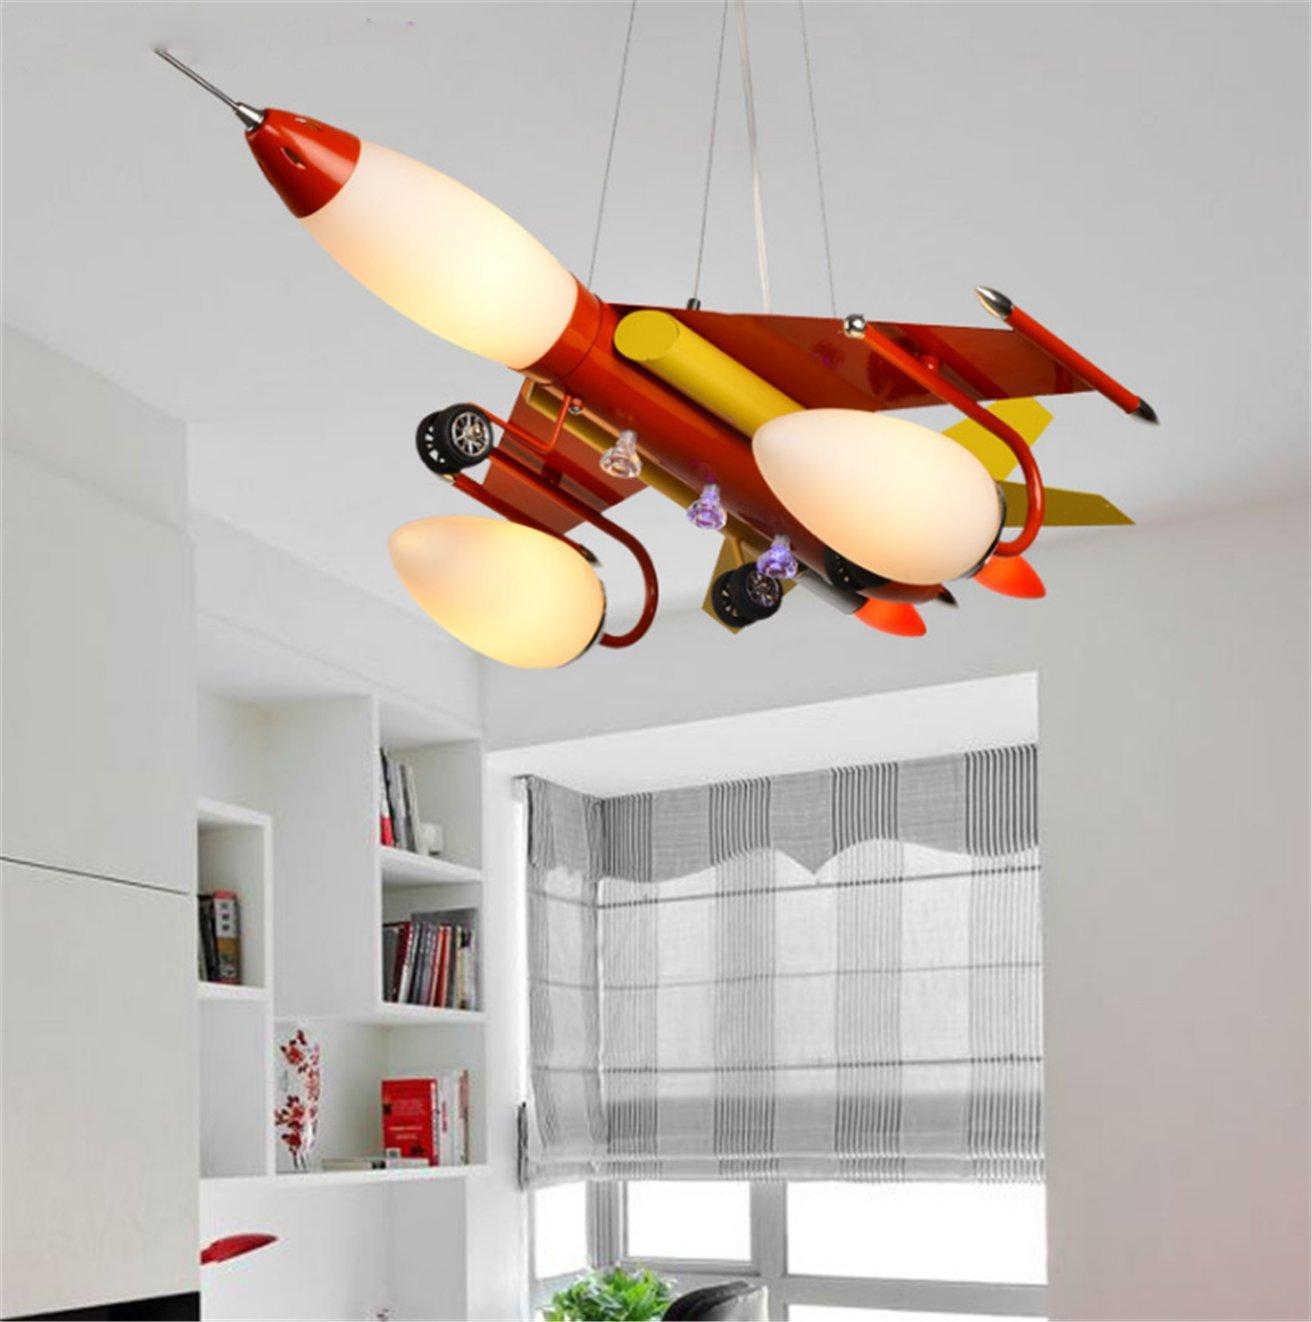 Flugzeug Lampe Junge Schlafzimmer Kinderzimmerlampe Pendelleuchte ...